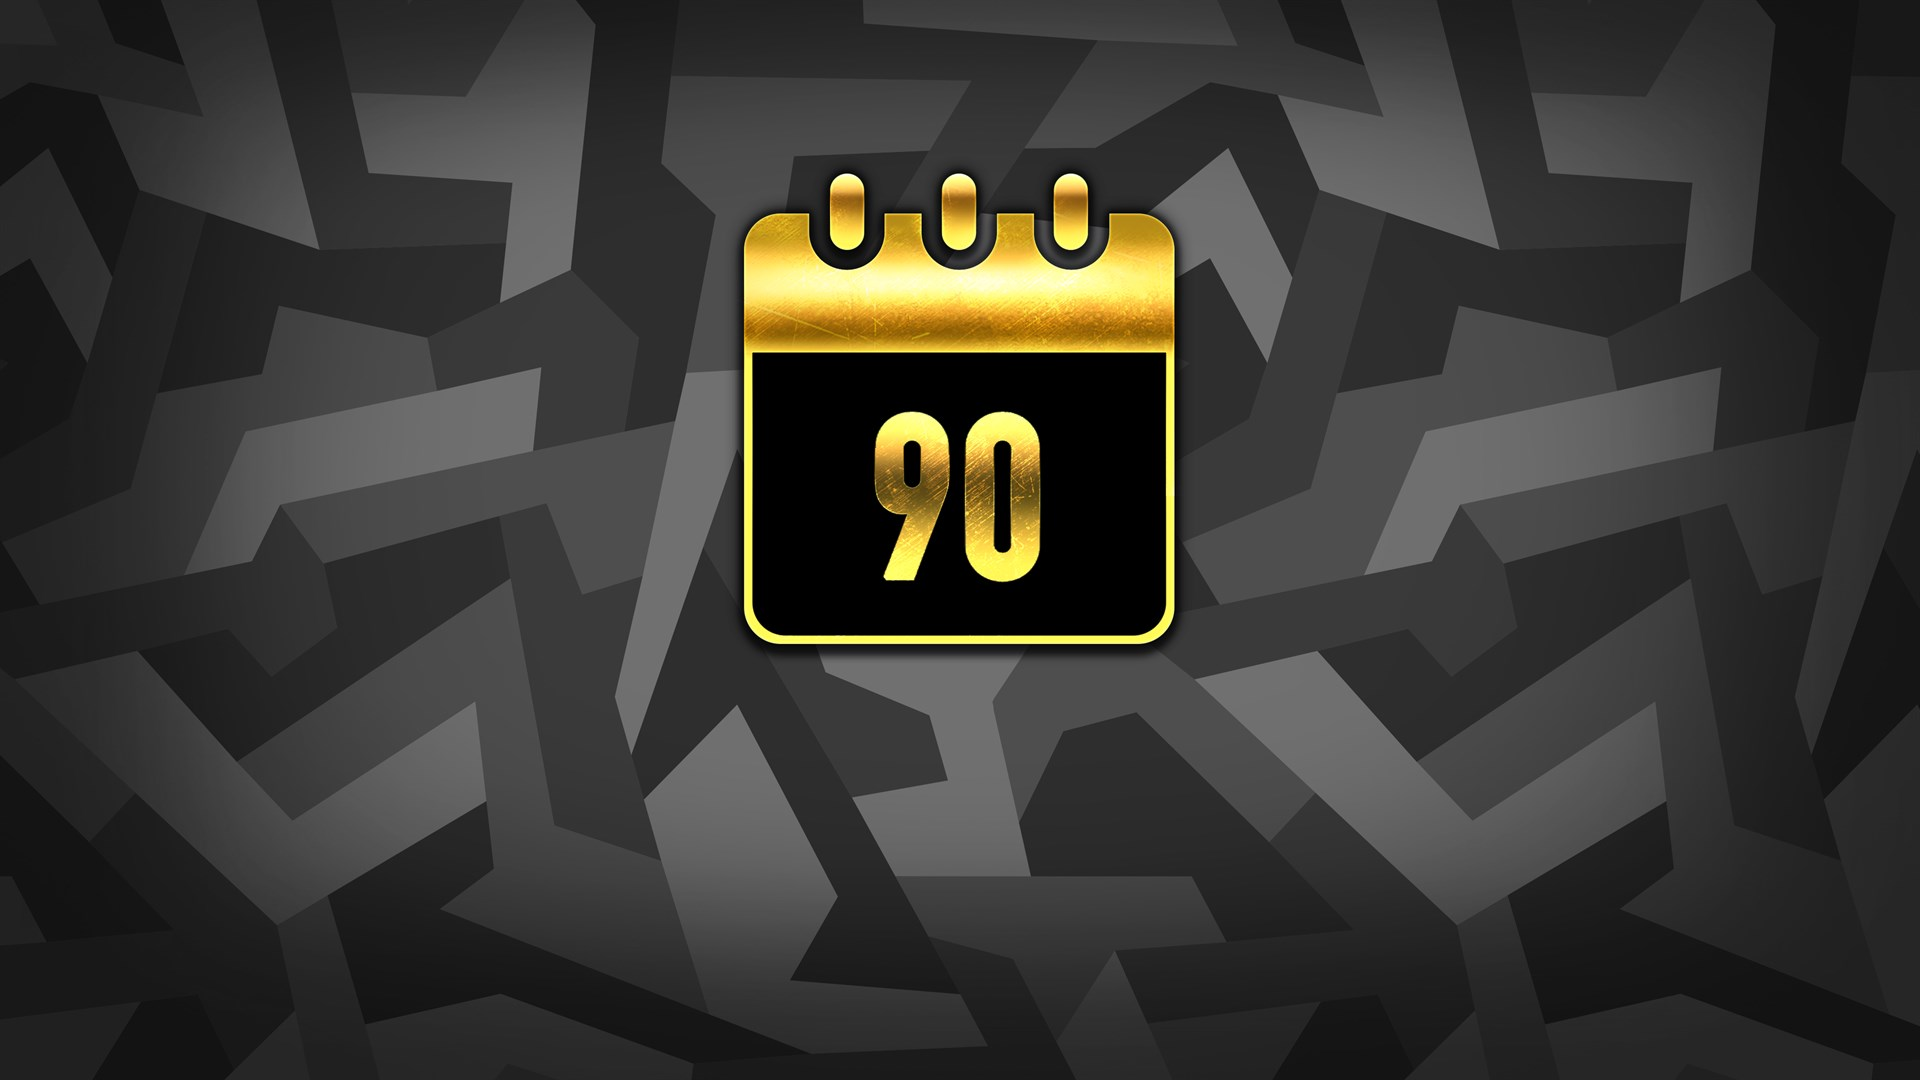 Armored Warfare - 90 days of Premium Time